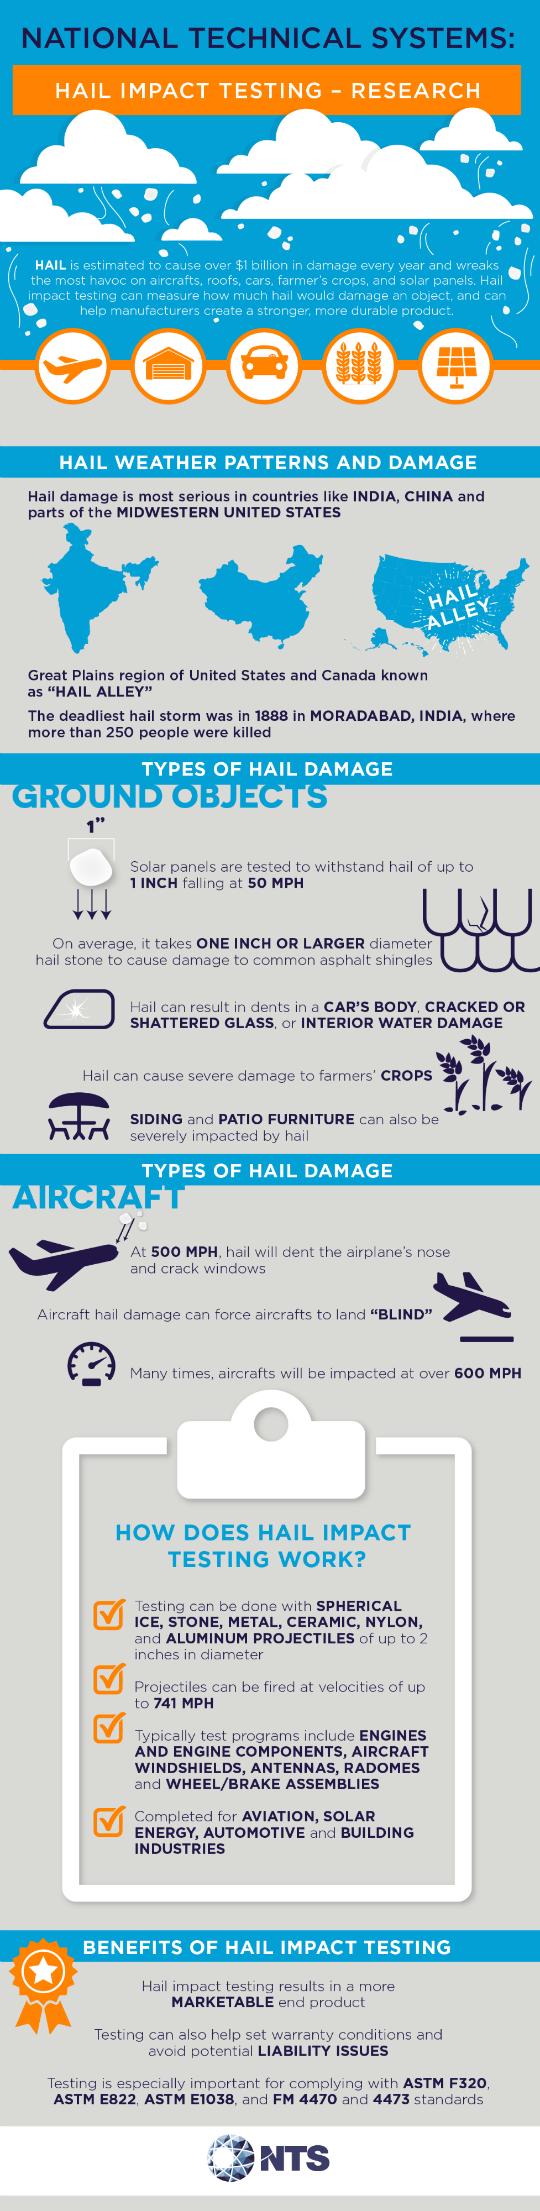 hail impact testing